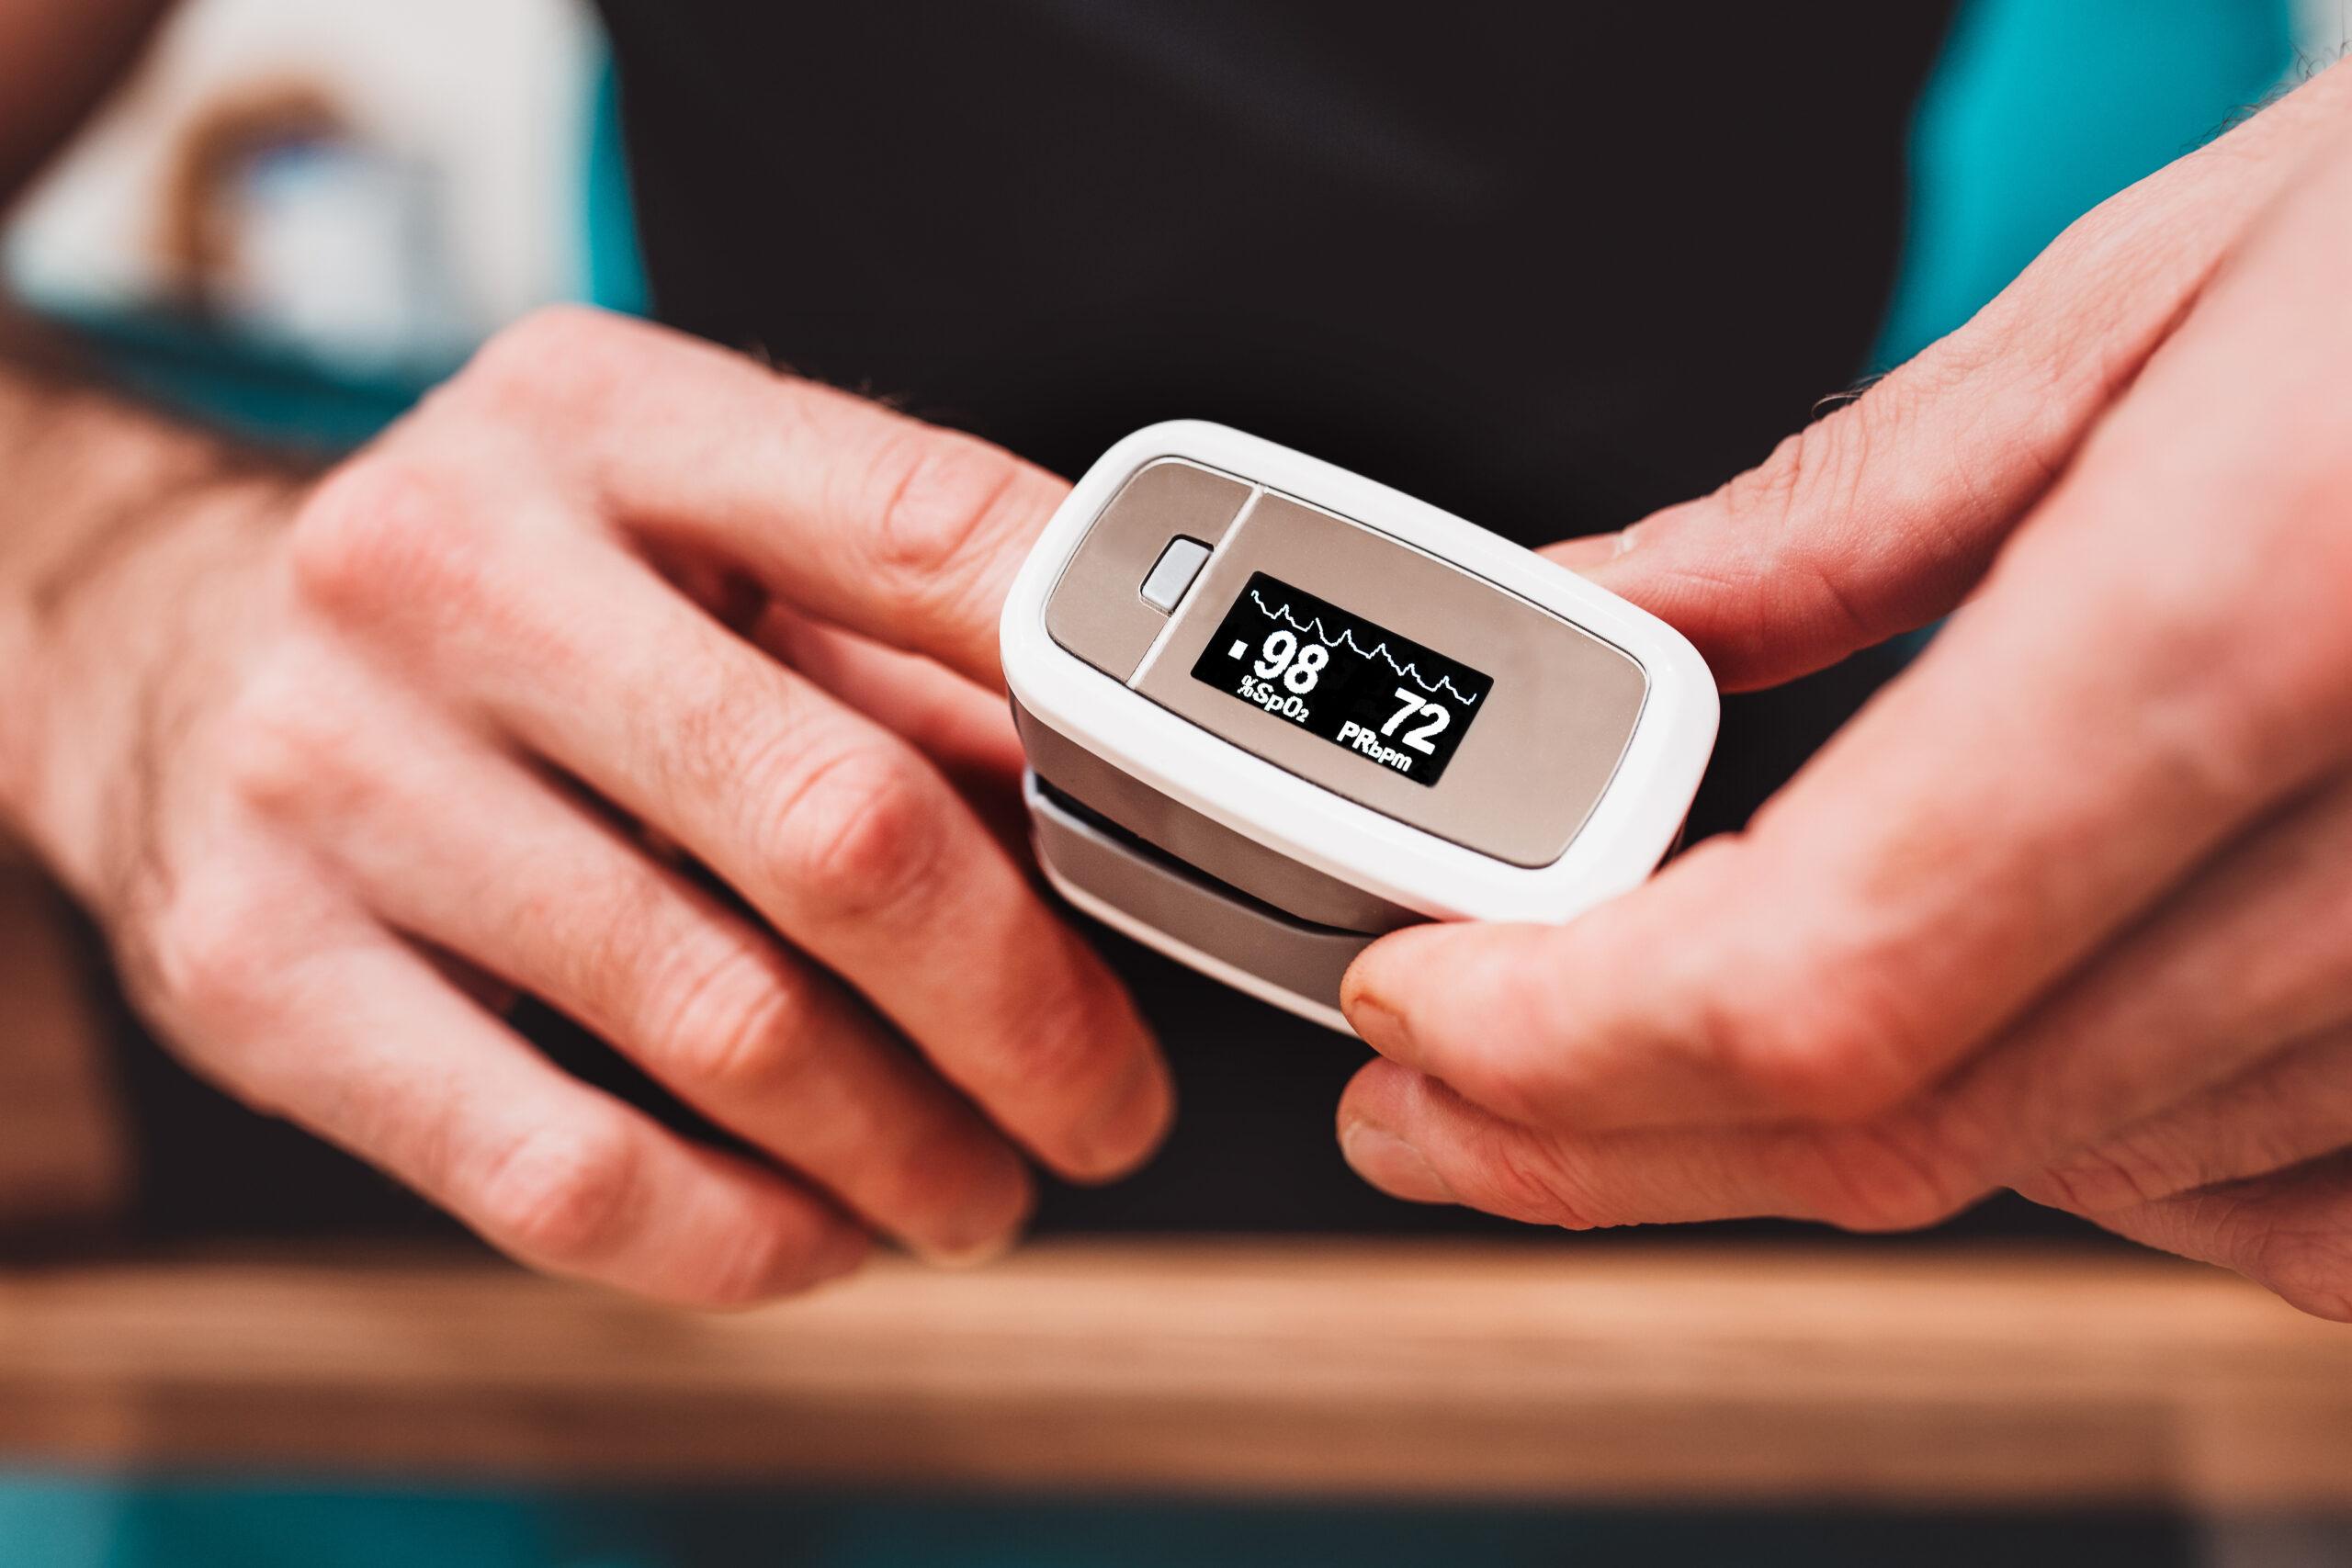 Sauerstoff Therapie mit Puls Oximeter